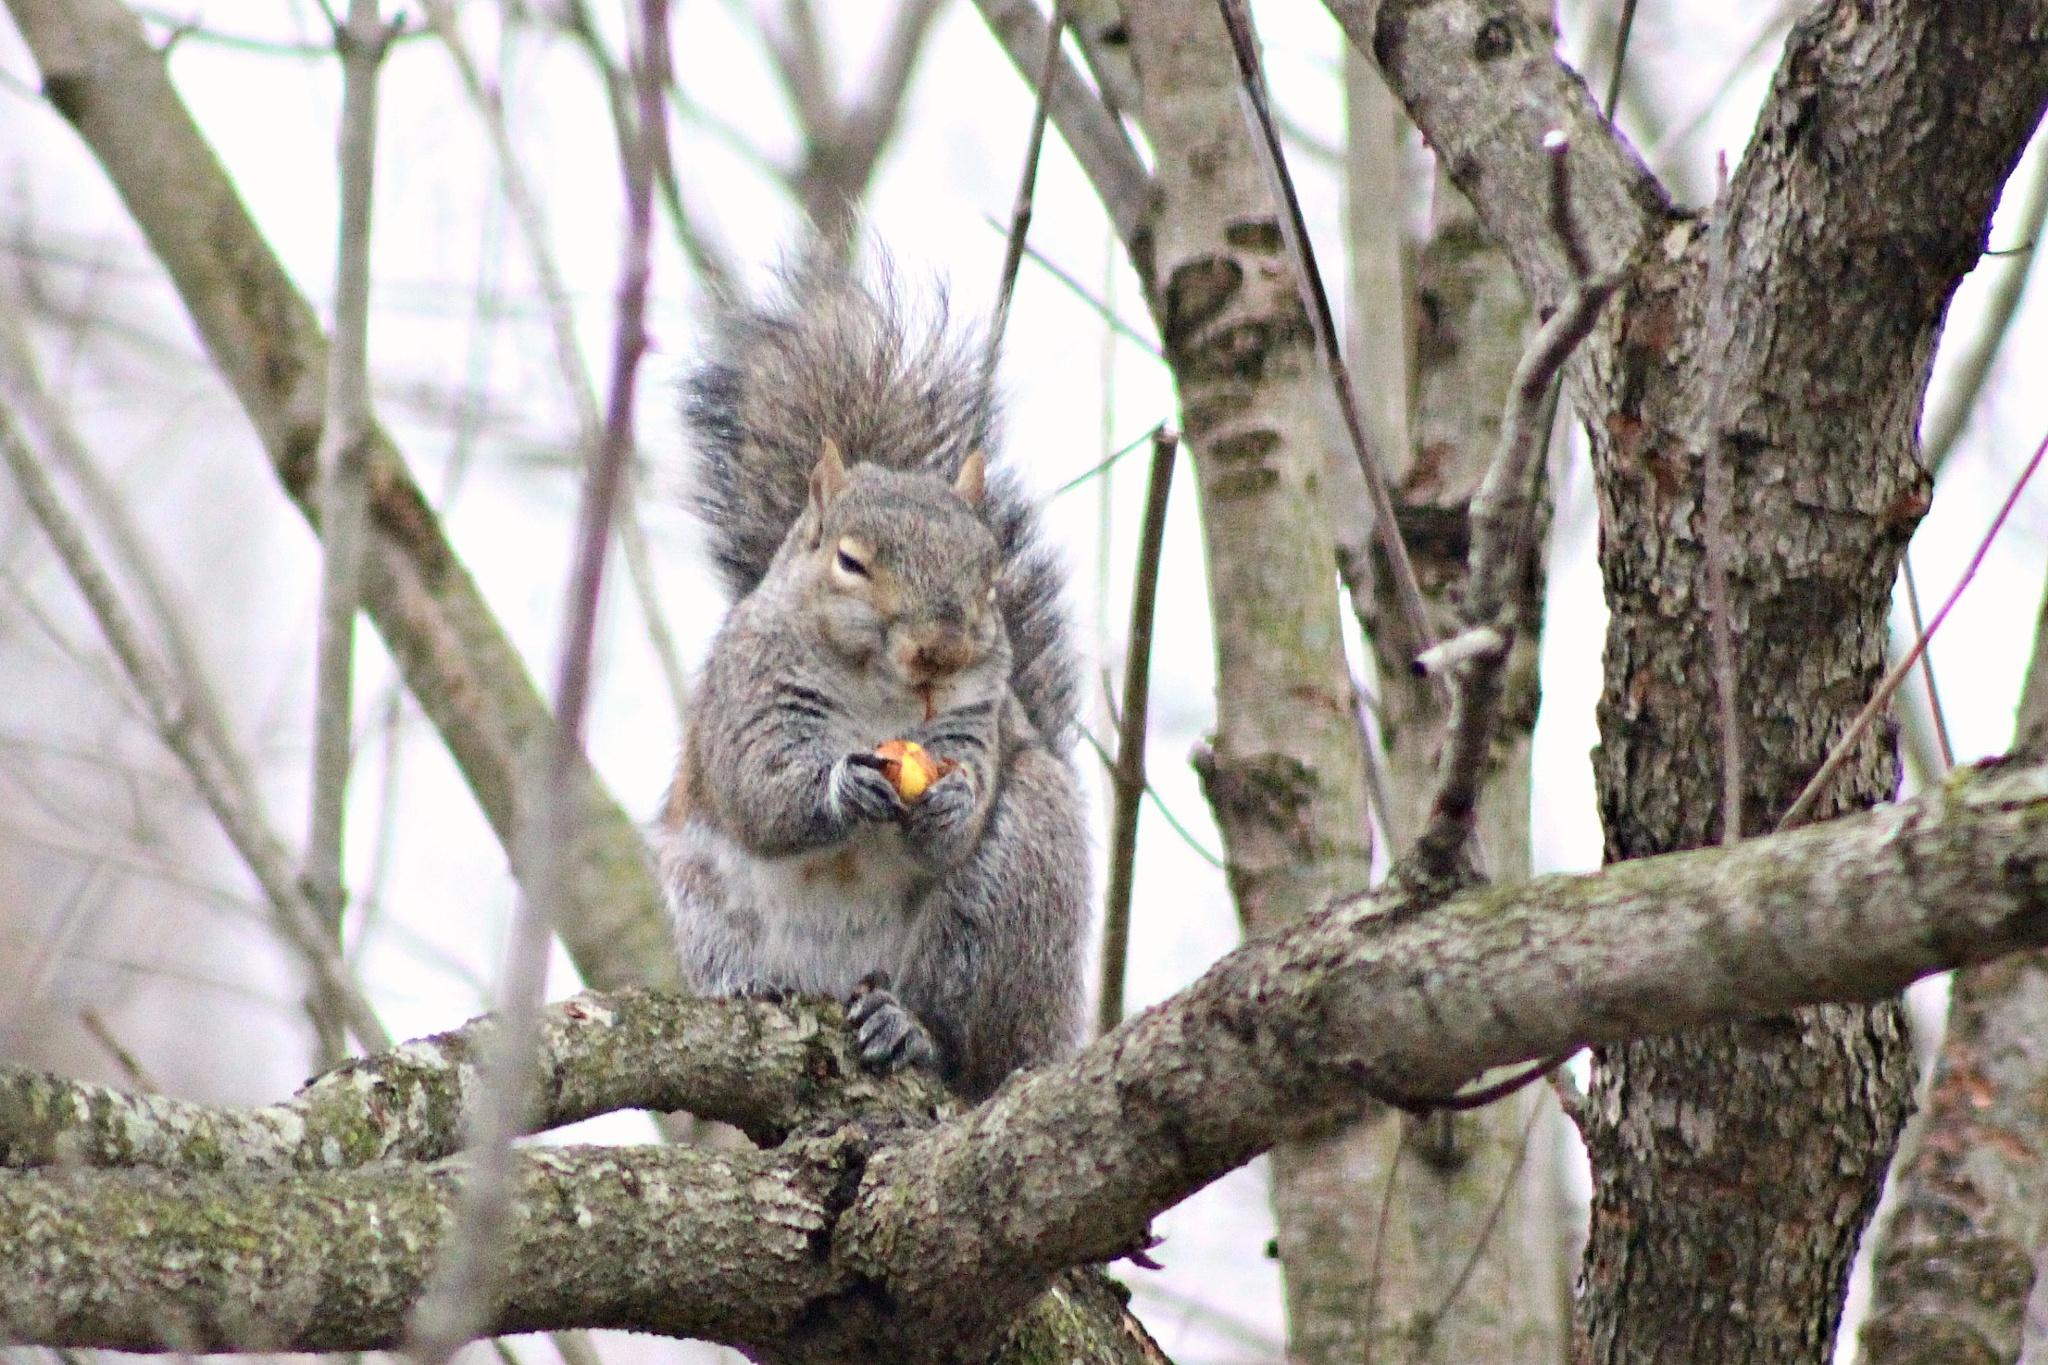 Female Squirrel by Brenda Updike